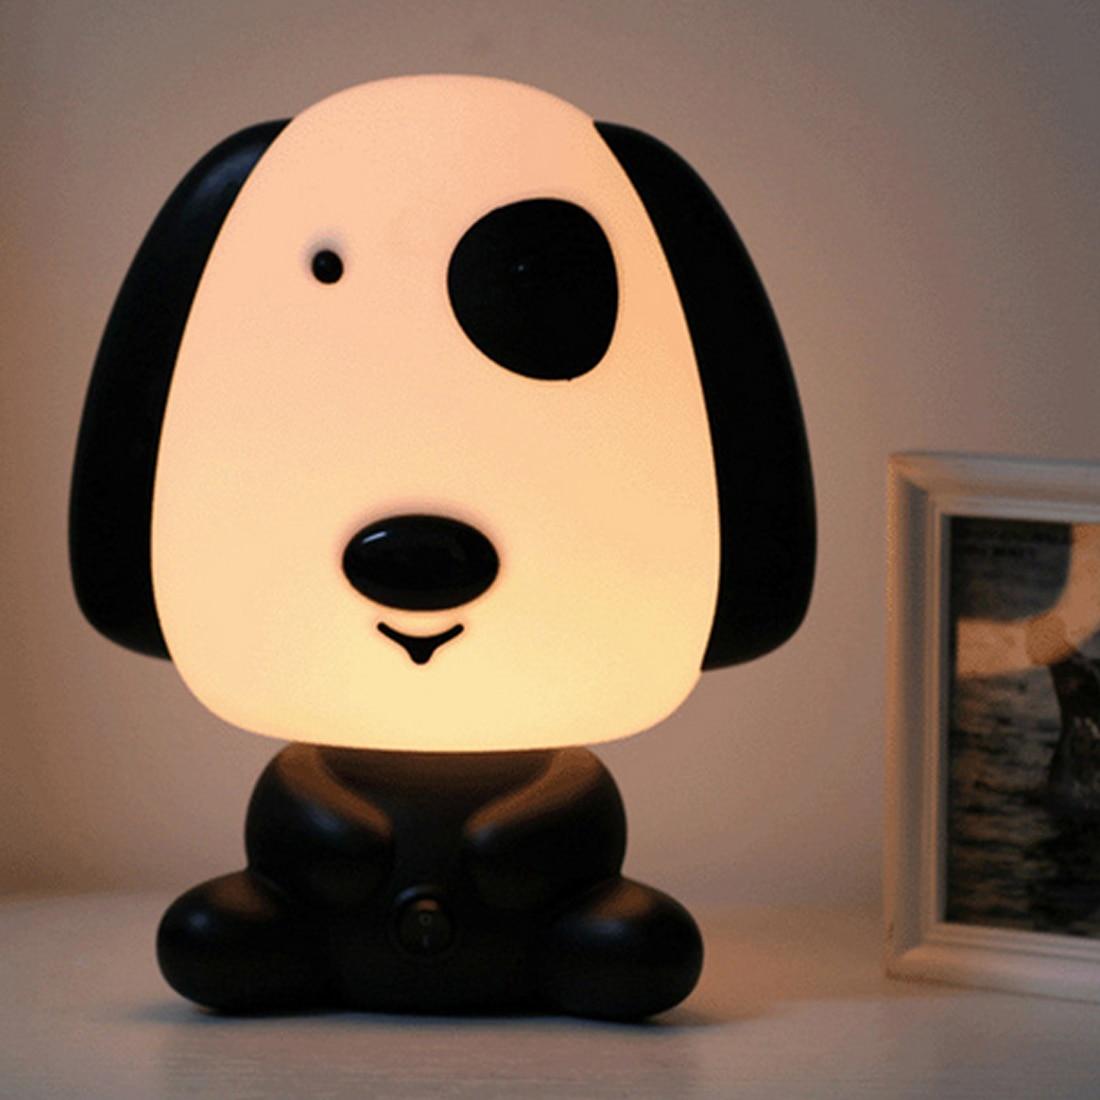 EU Plug Baby Bedroom Lamps Night Light Cartoon Pets Rabbit Panda PVC Plastic Sleep Led Lamp Bulb Nightlight For Children